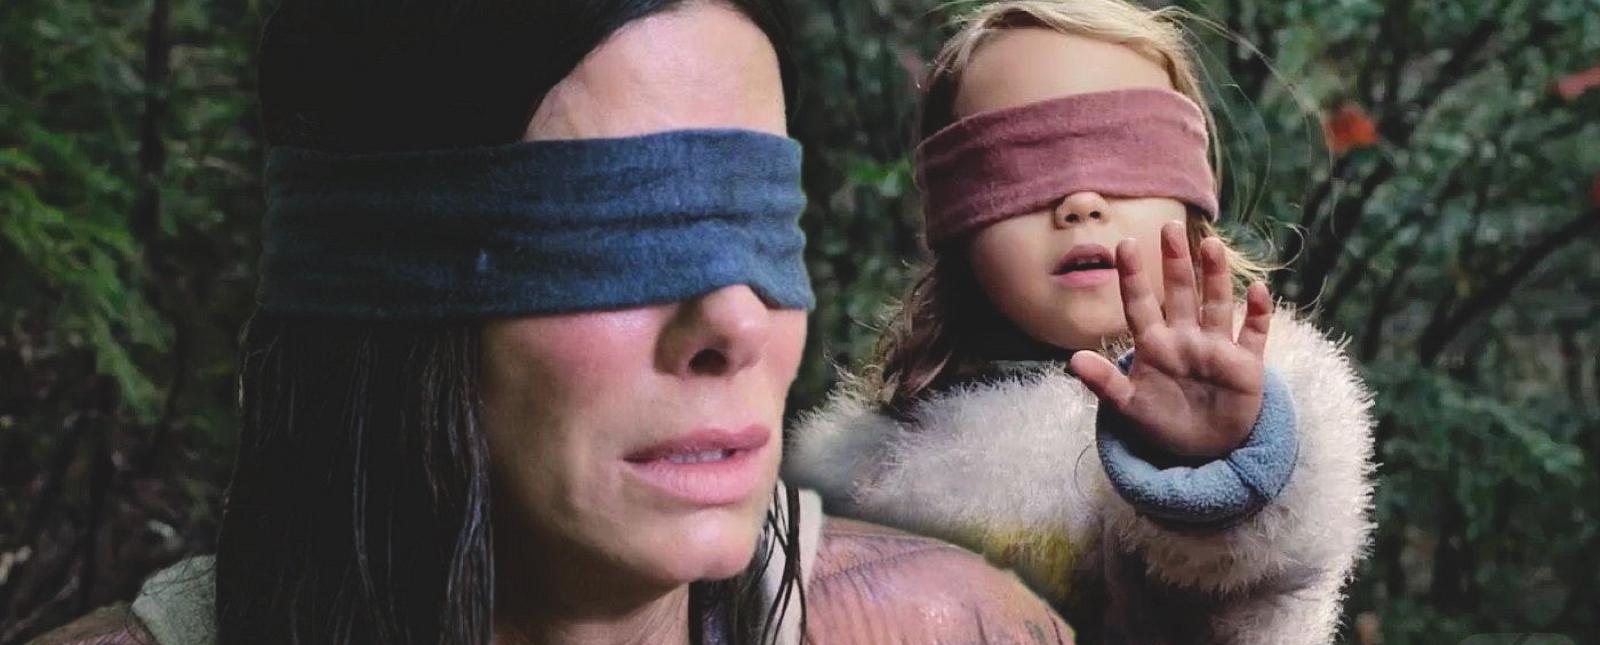 El verdadero final de Bird Box que Netflix censuró por ser demasiado fuerte